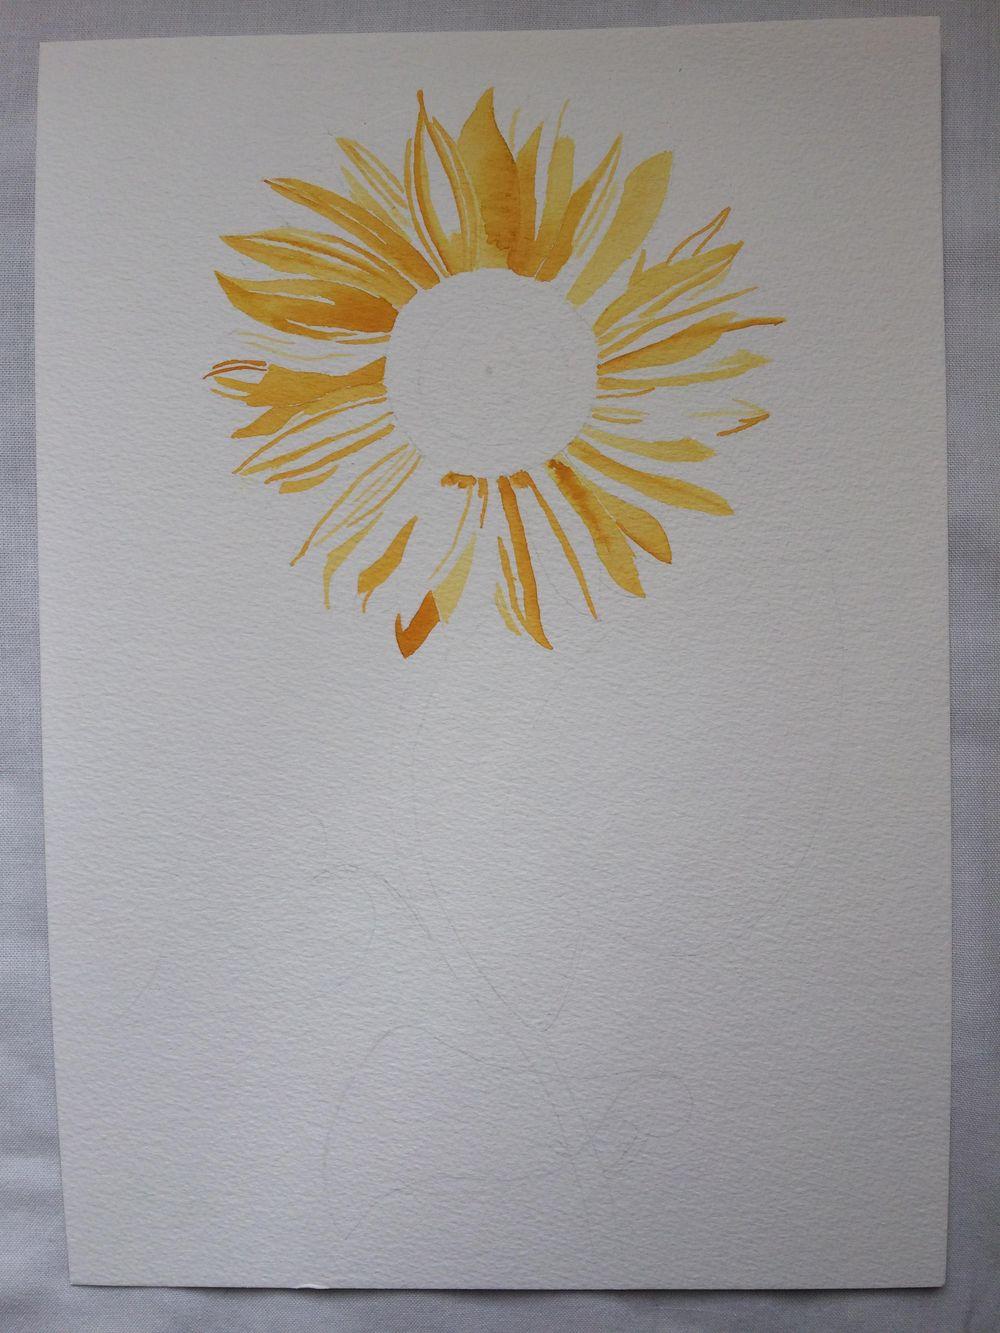 Mixed Midea Vintage-Inspired Botanical Illustration - image 2 - student project